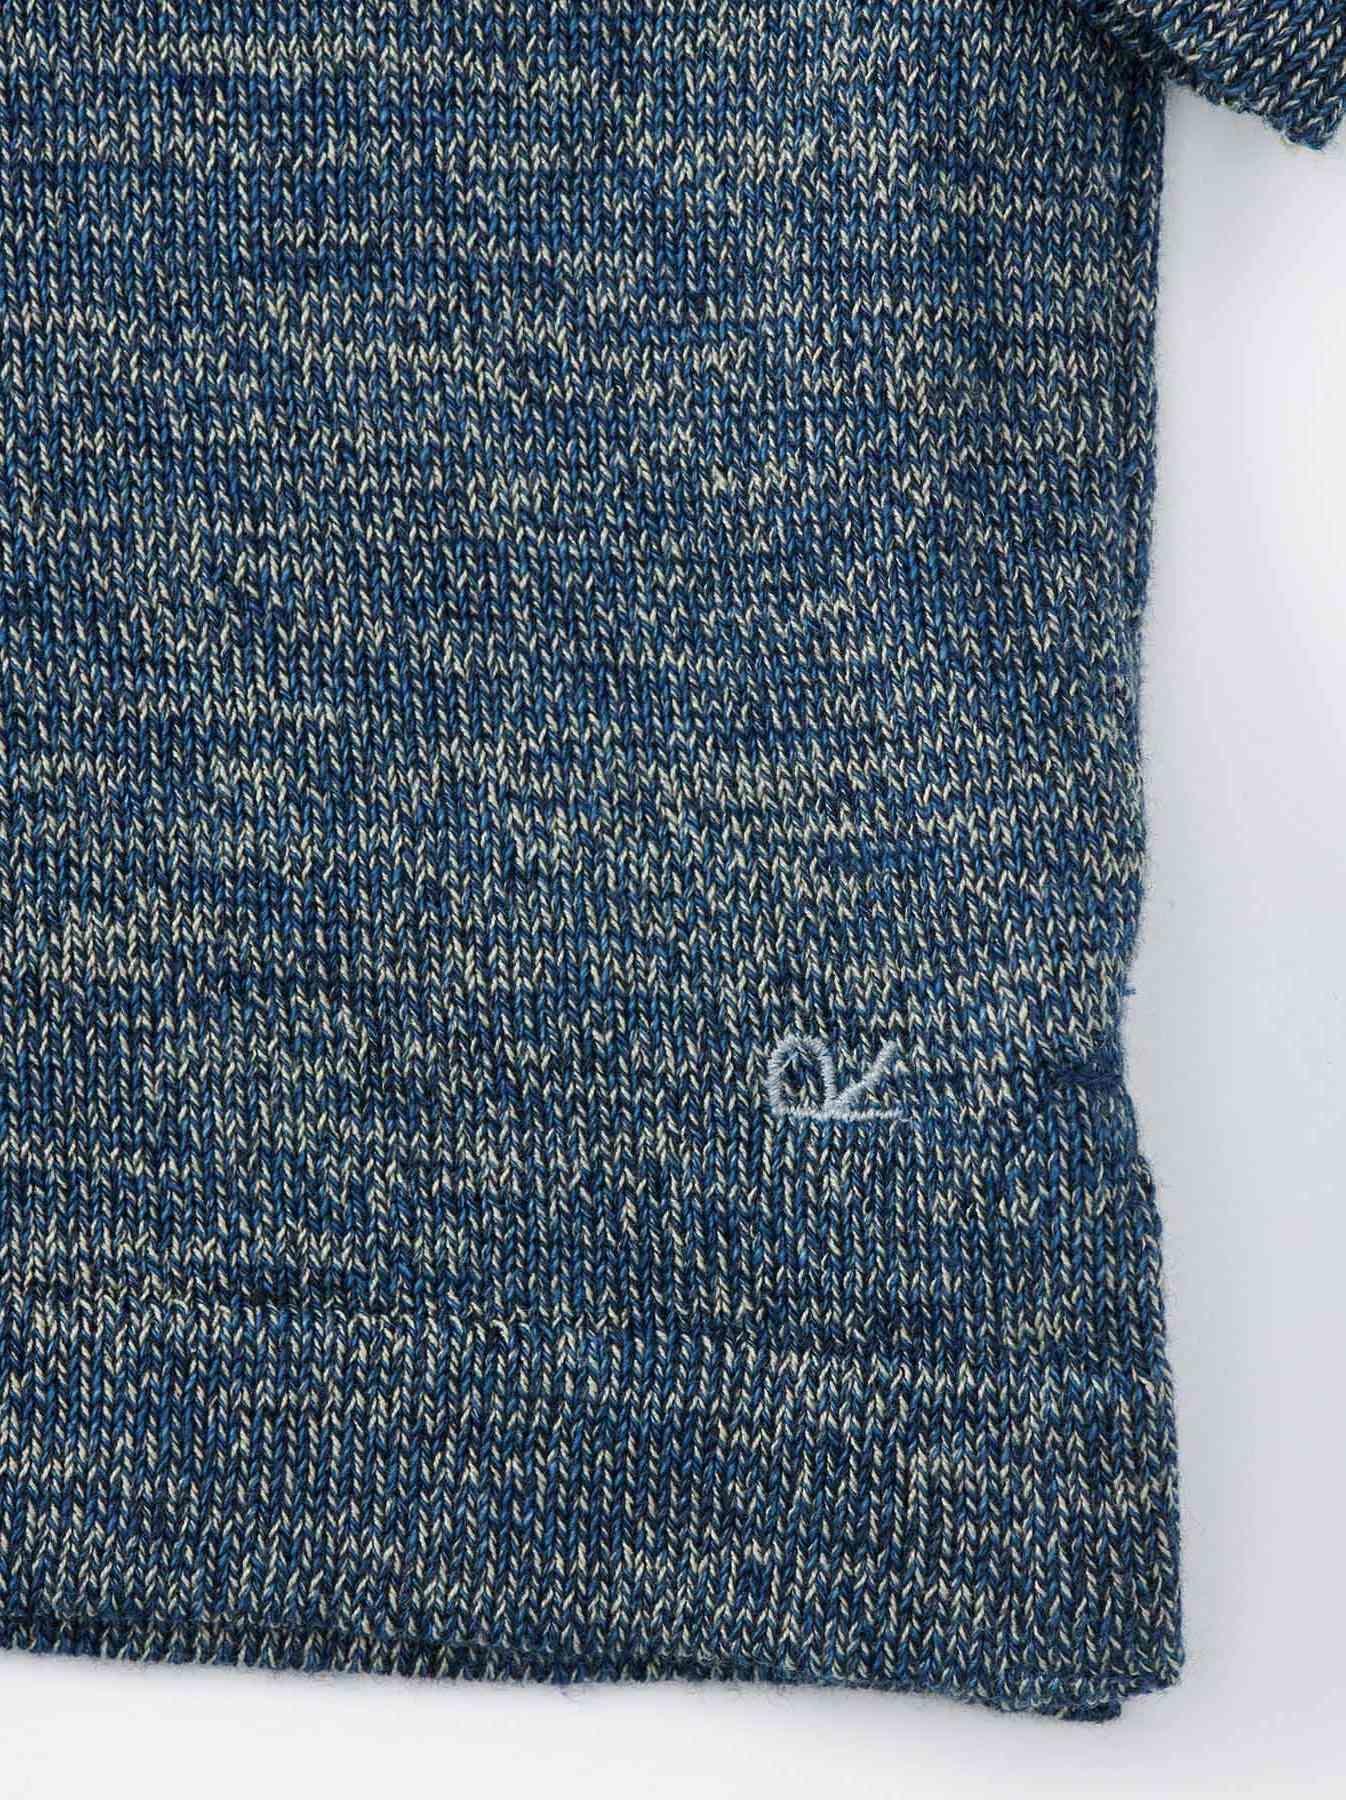 WH Gauze Basque Knit T-shirt-8